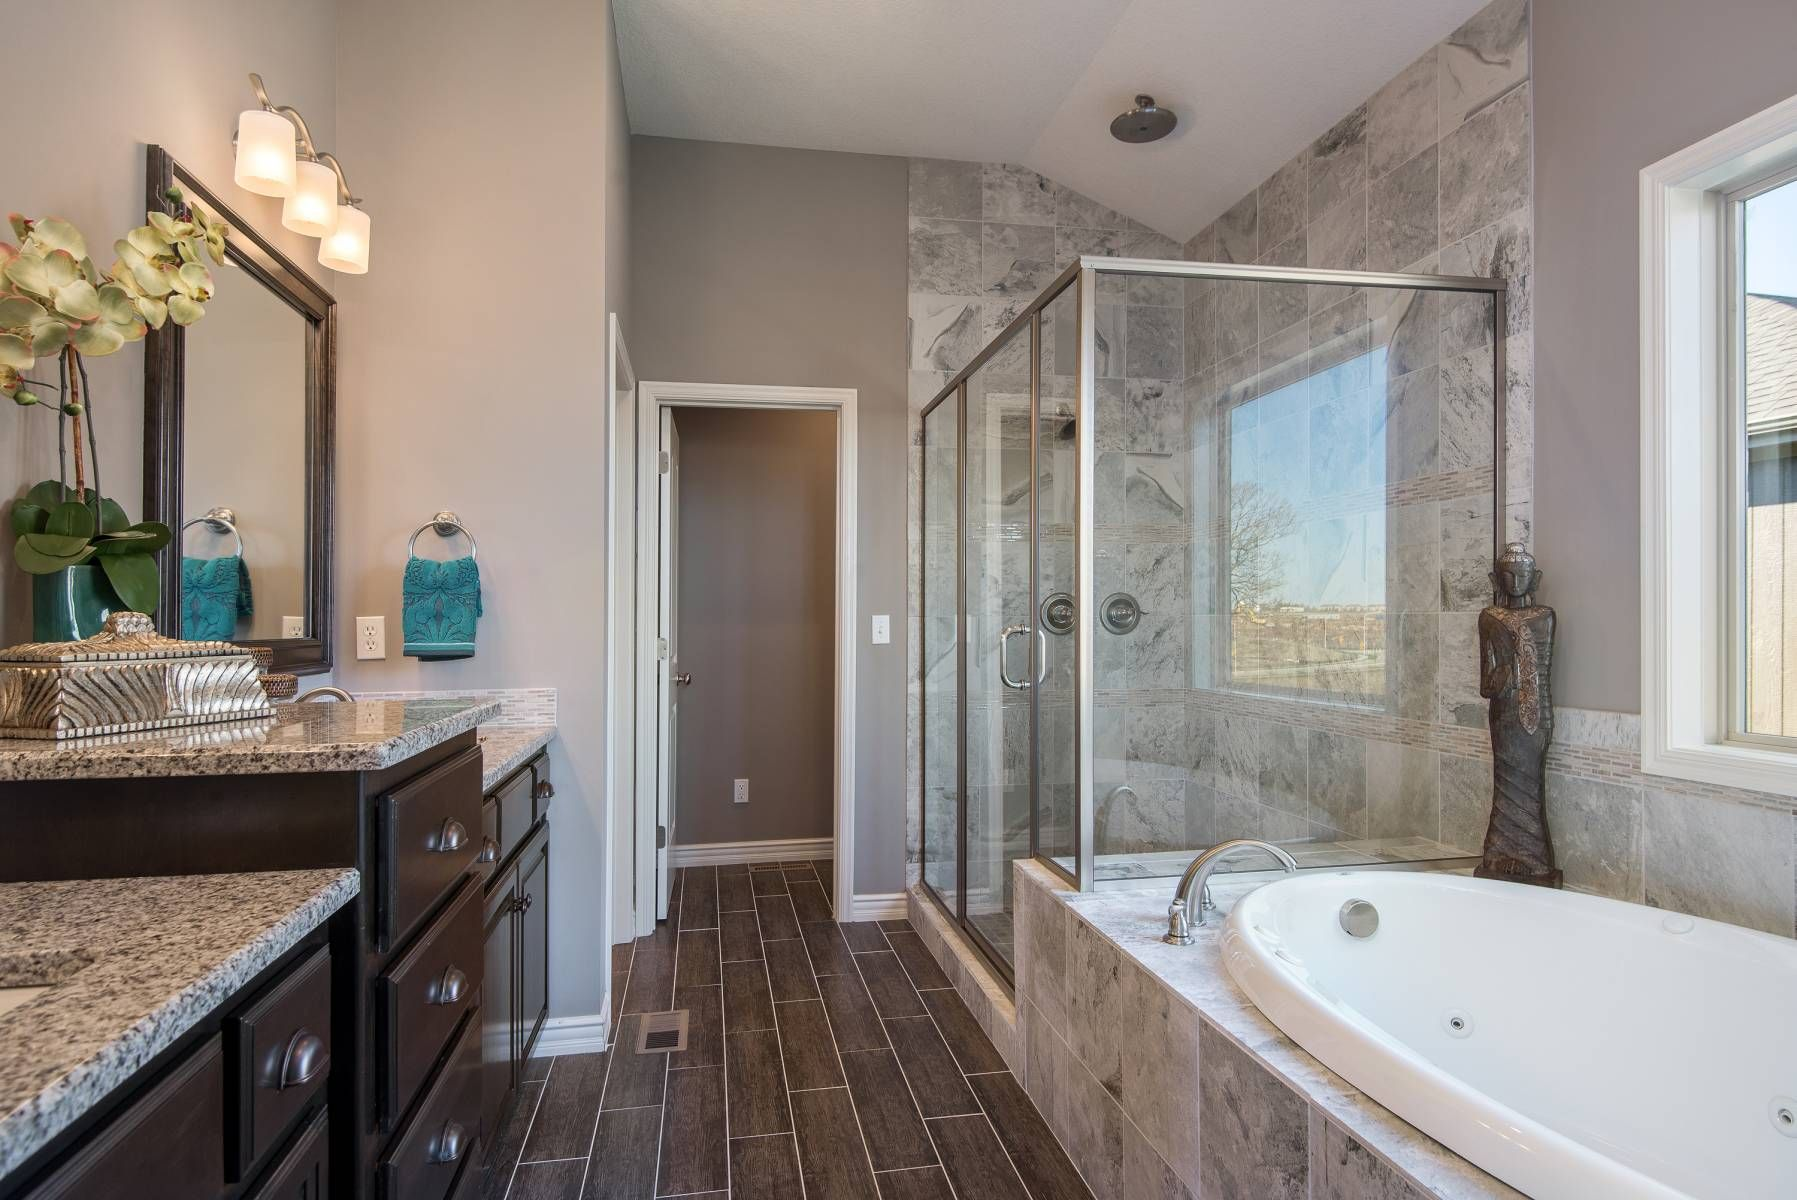 Dark vanity cabinets and cool grey walls